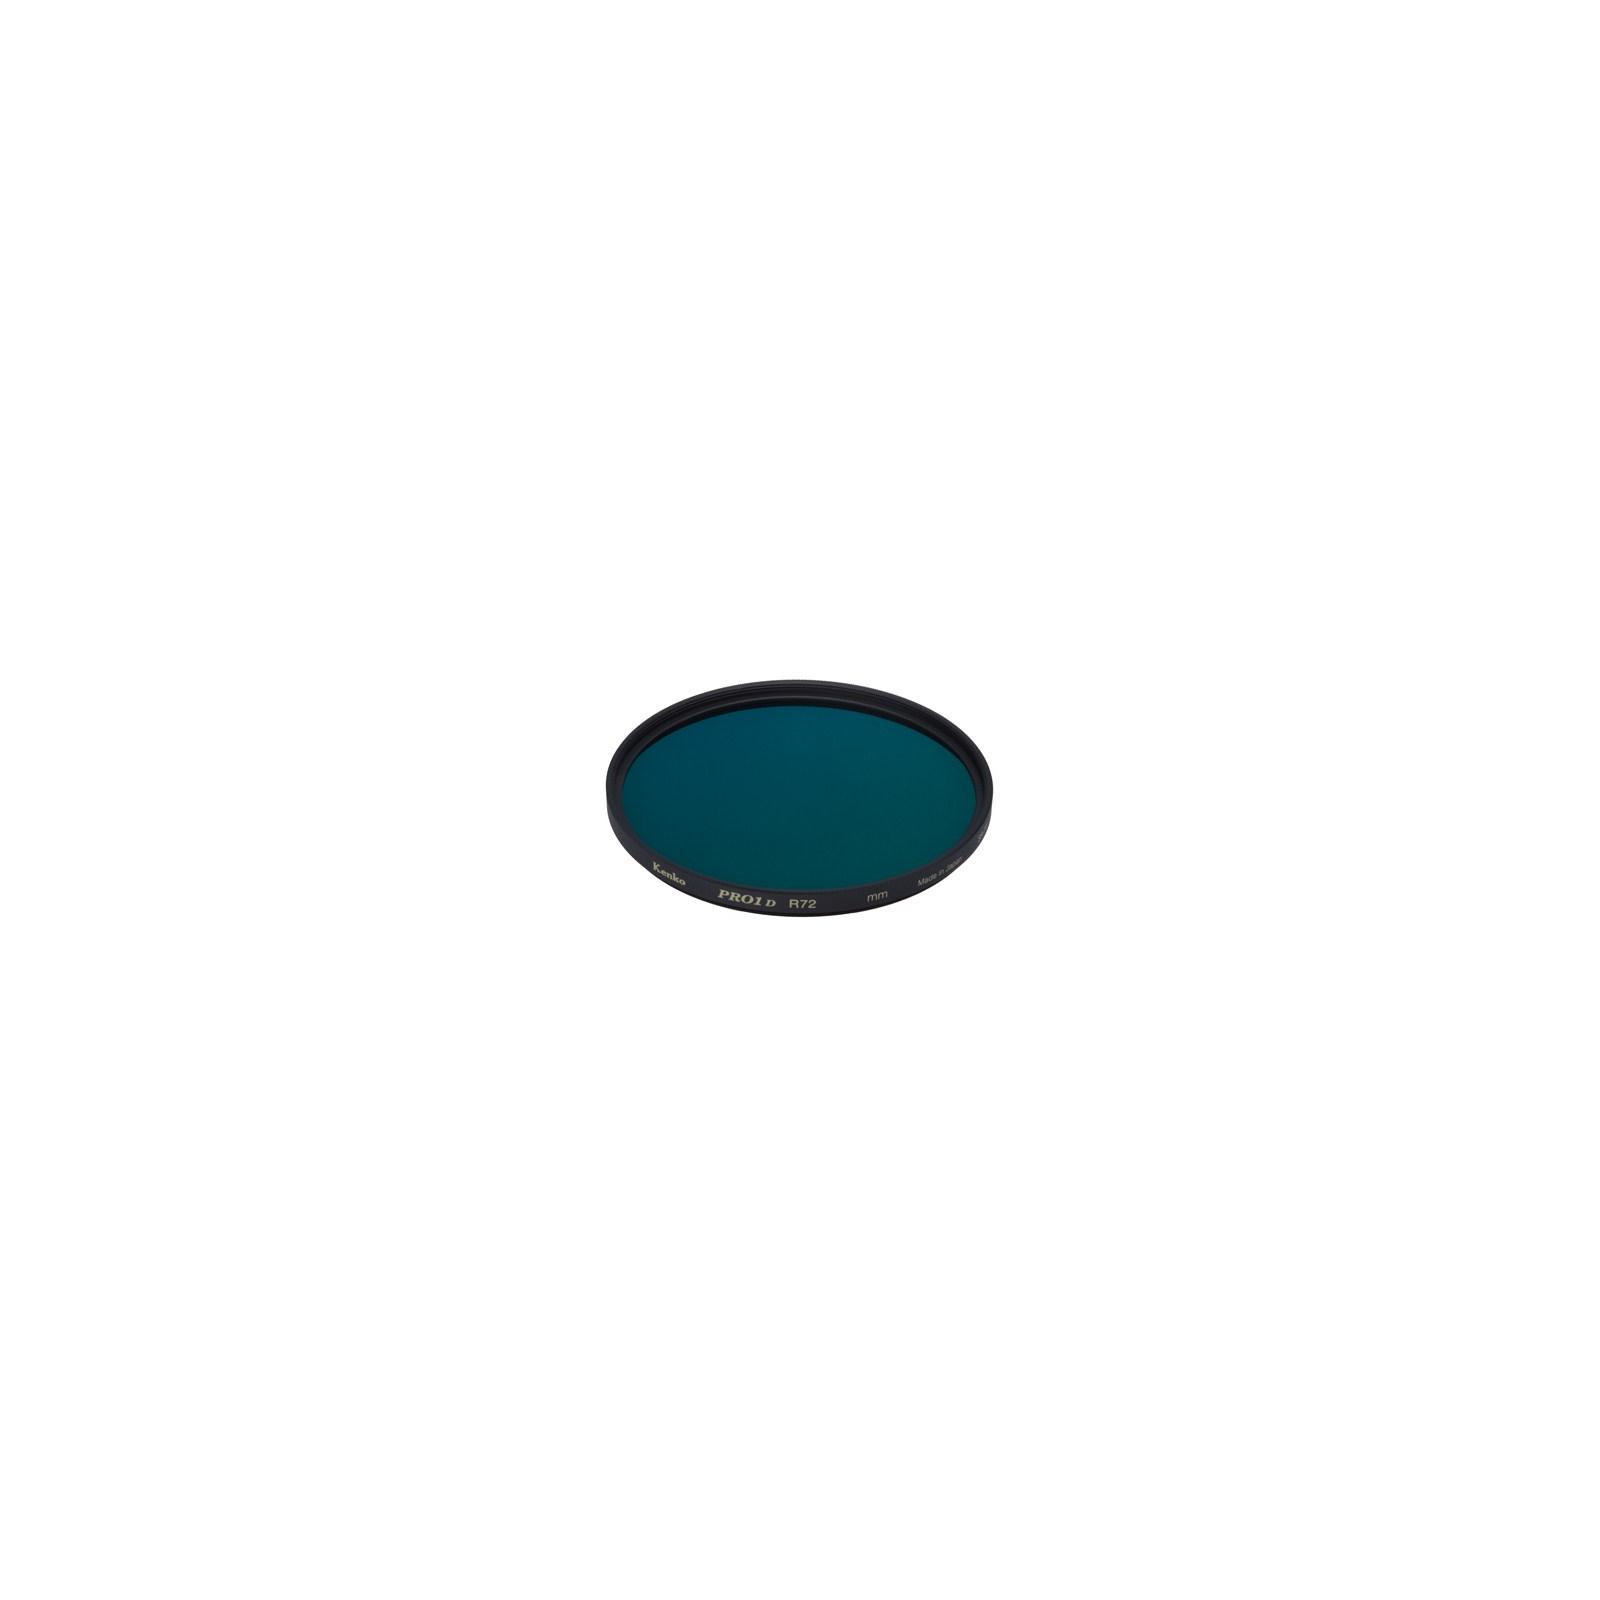 Светофильтр Kenko PRO1D R-72 67mm (326706)